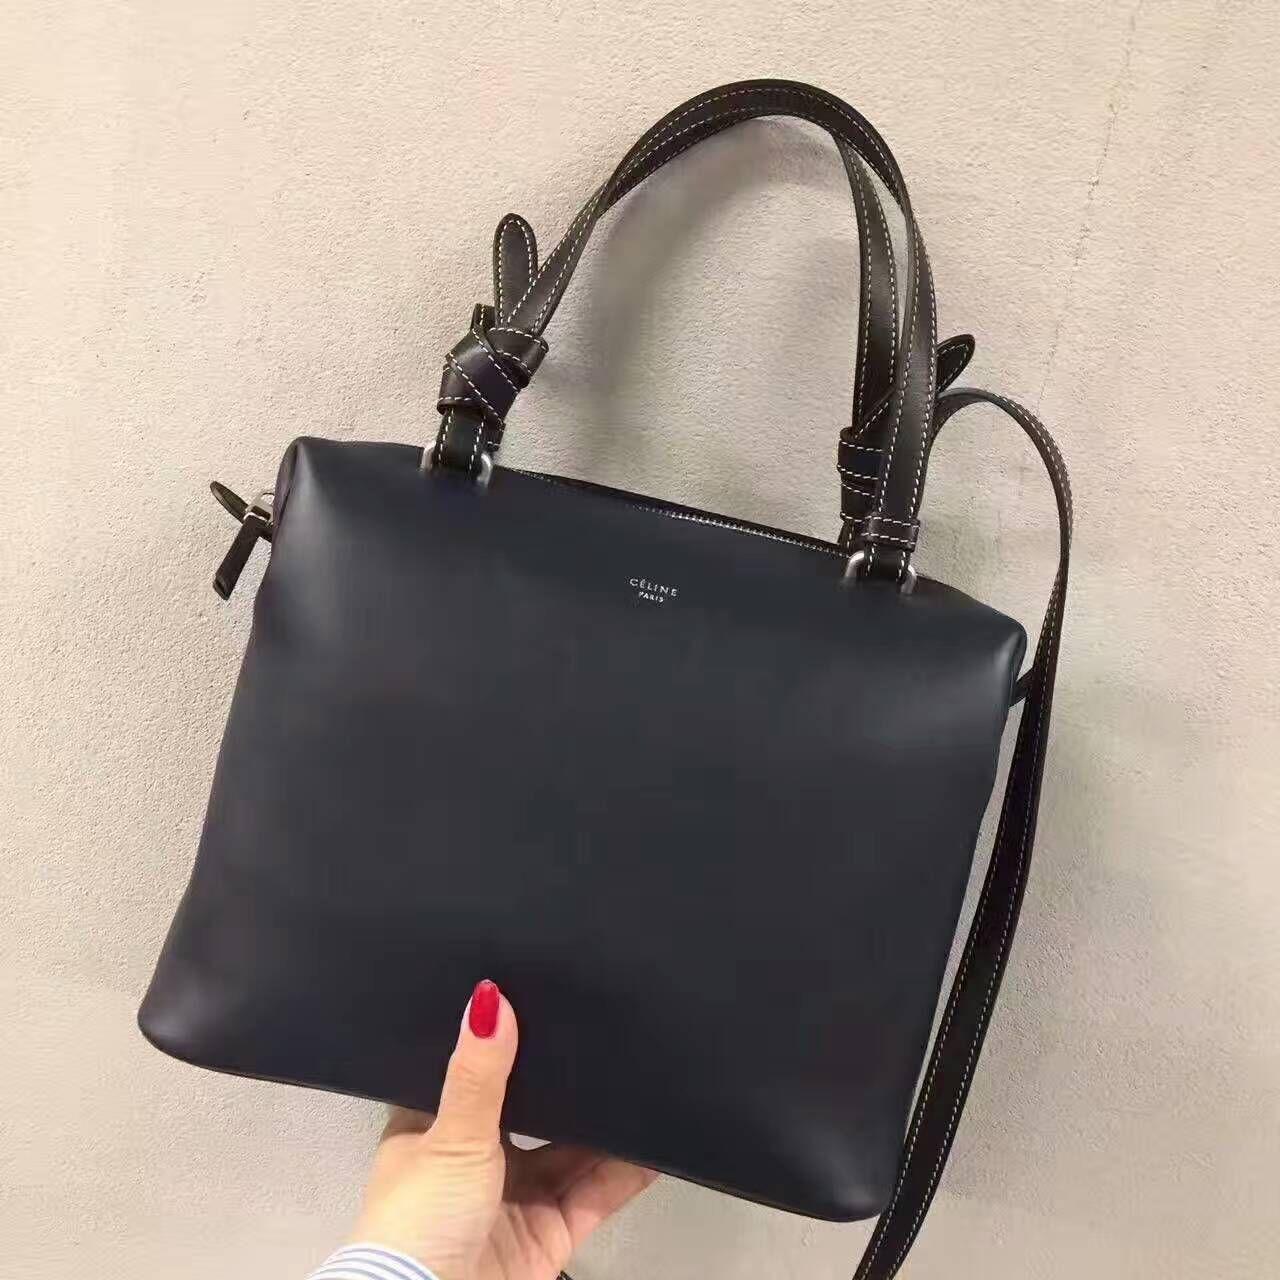 Summer 2017 Celine Small Soft Cube Bag in Black Smooth Calfskin ... b6b842b463e47